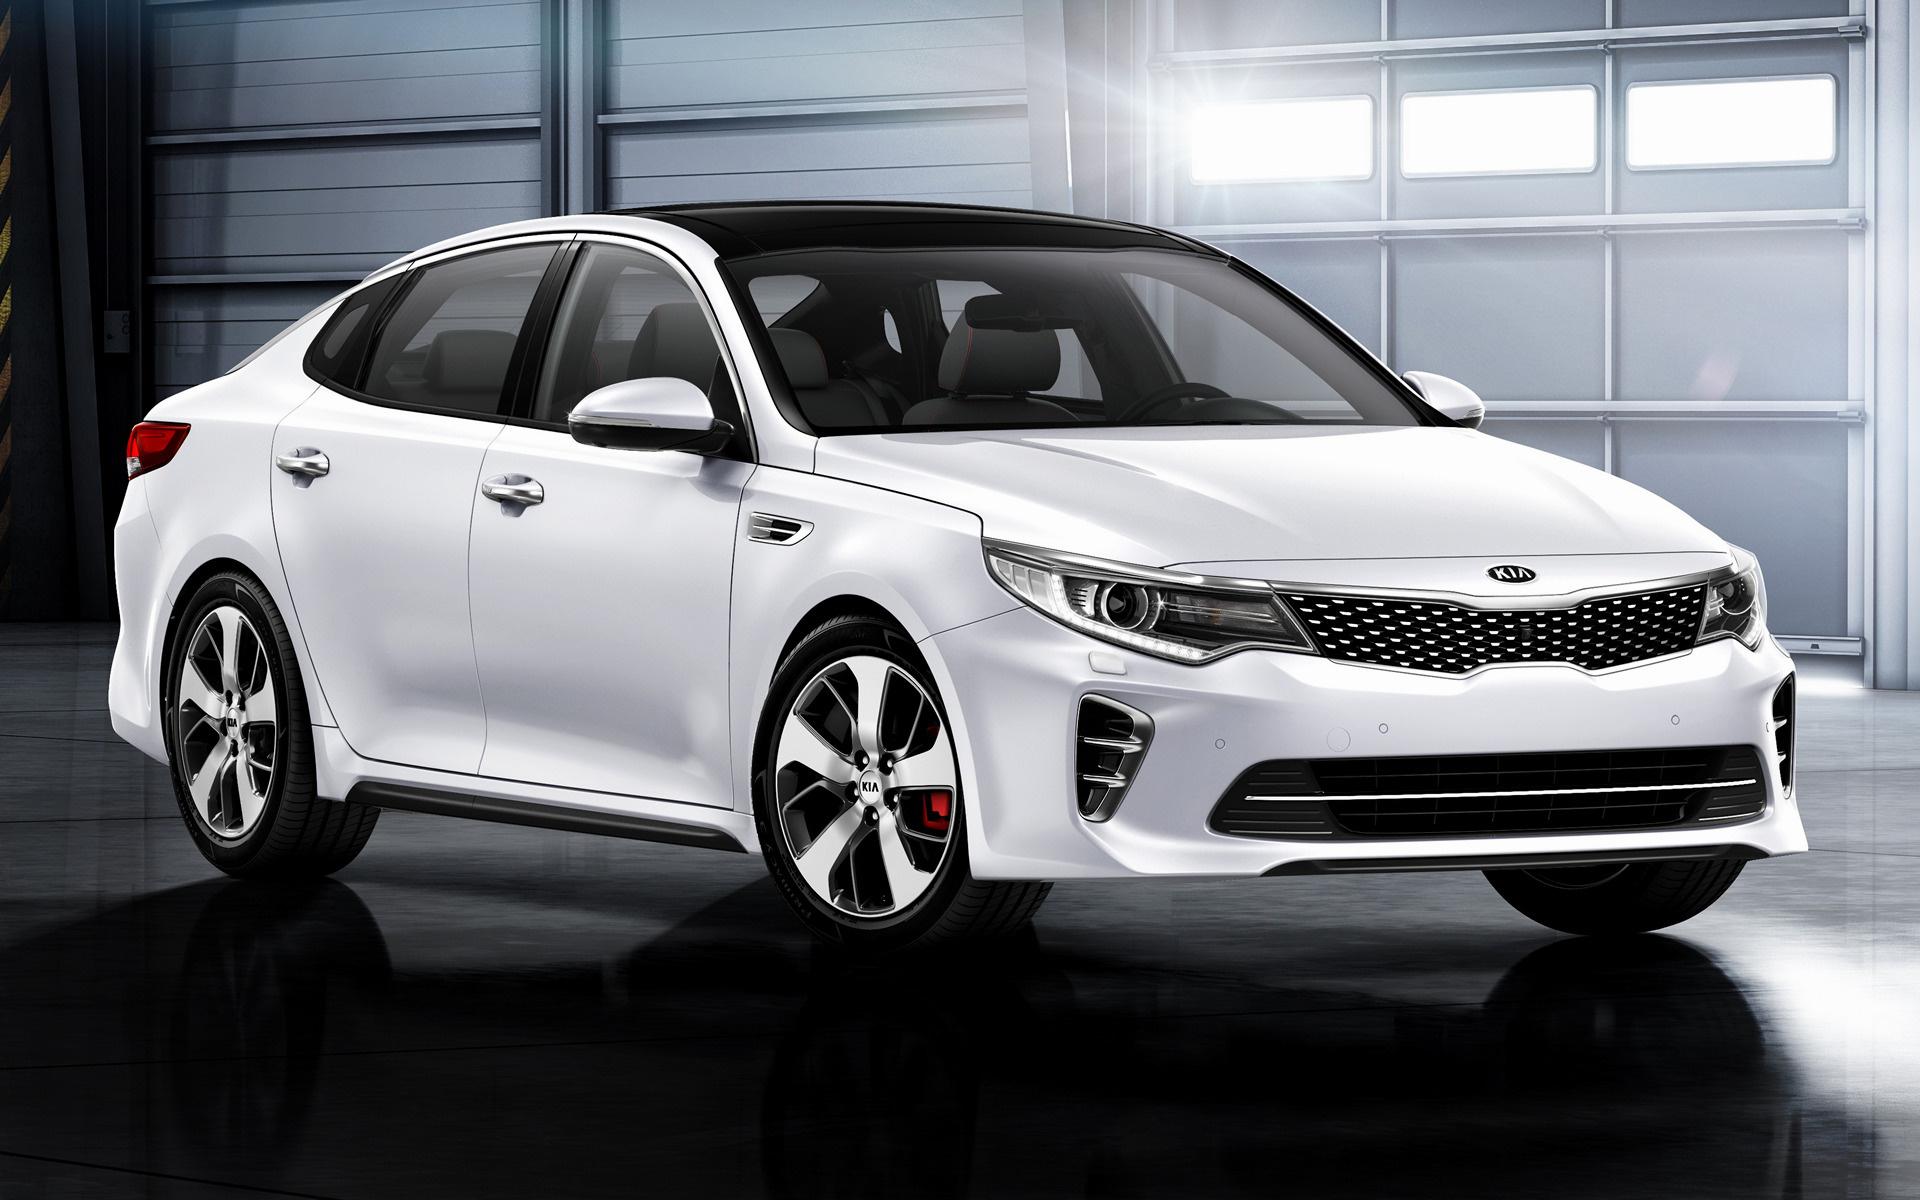 2016 Kia Optima Hybrid >> 2016 Kia Optima GT (EU) - Wallpapers and HD Images | Car Pixel